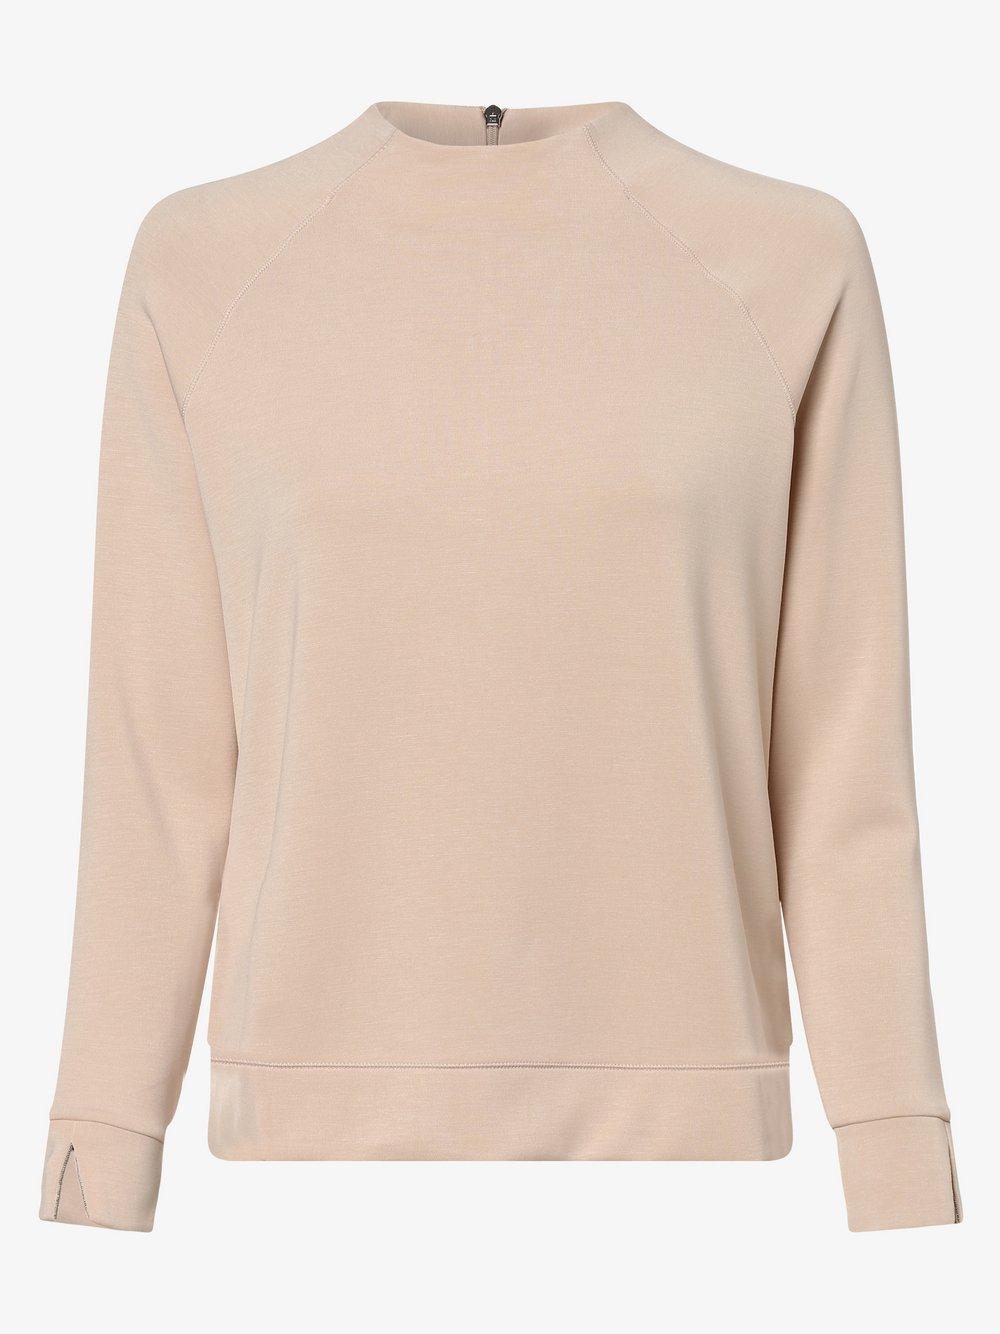 s.Oliver BLACK LABEL - Damska bluza nierozpinana, beżowy